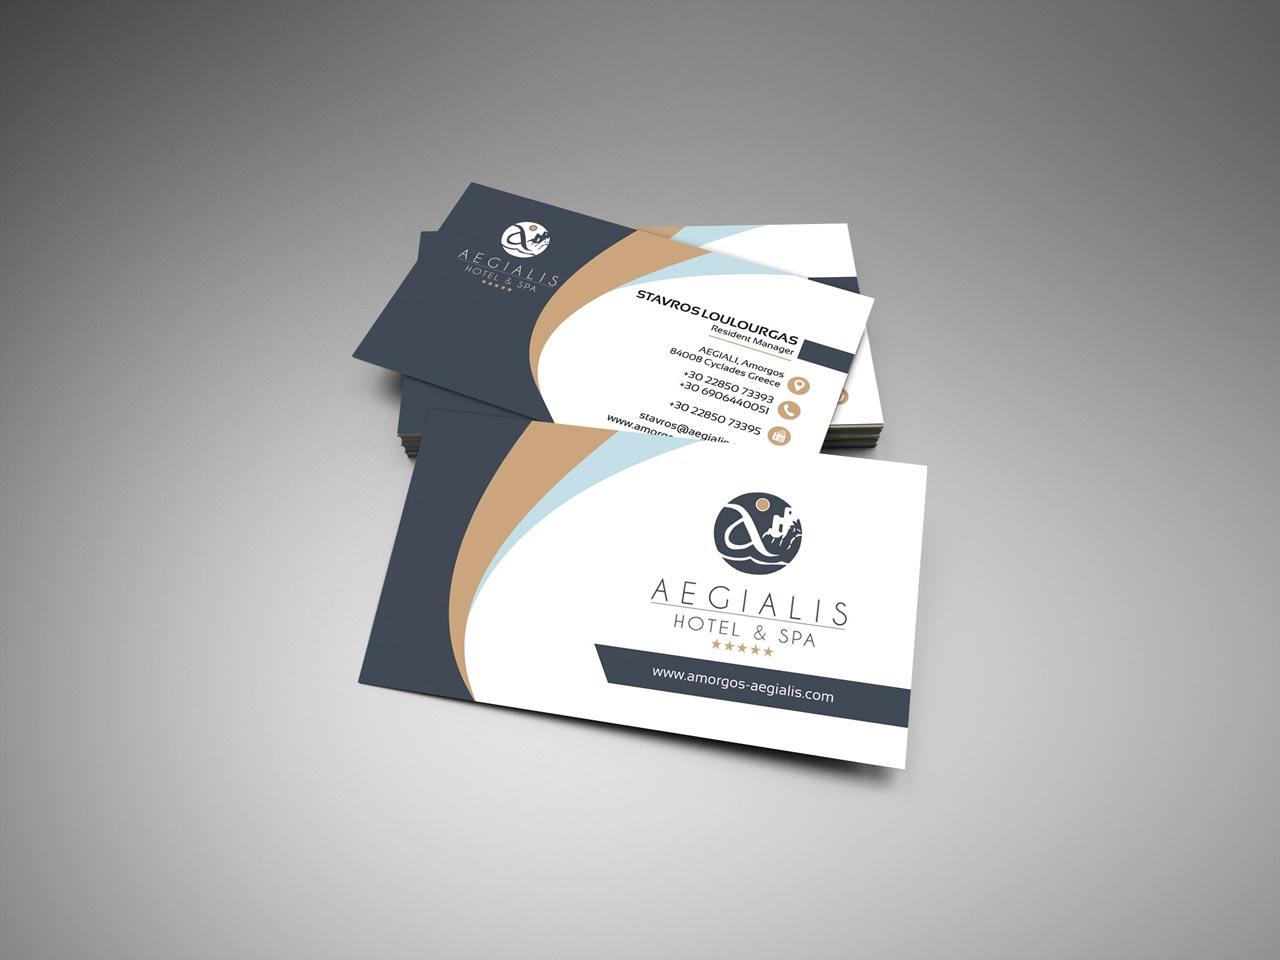 Aegialis Business card